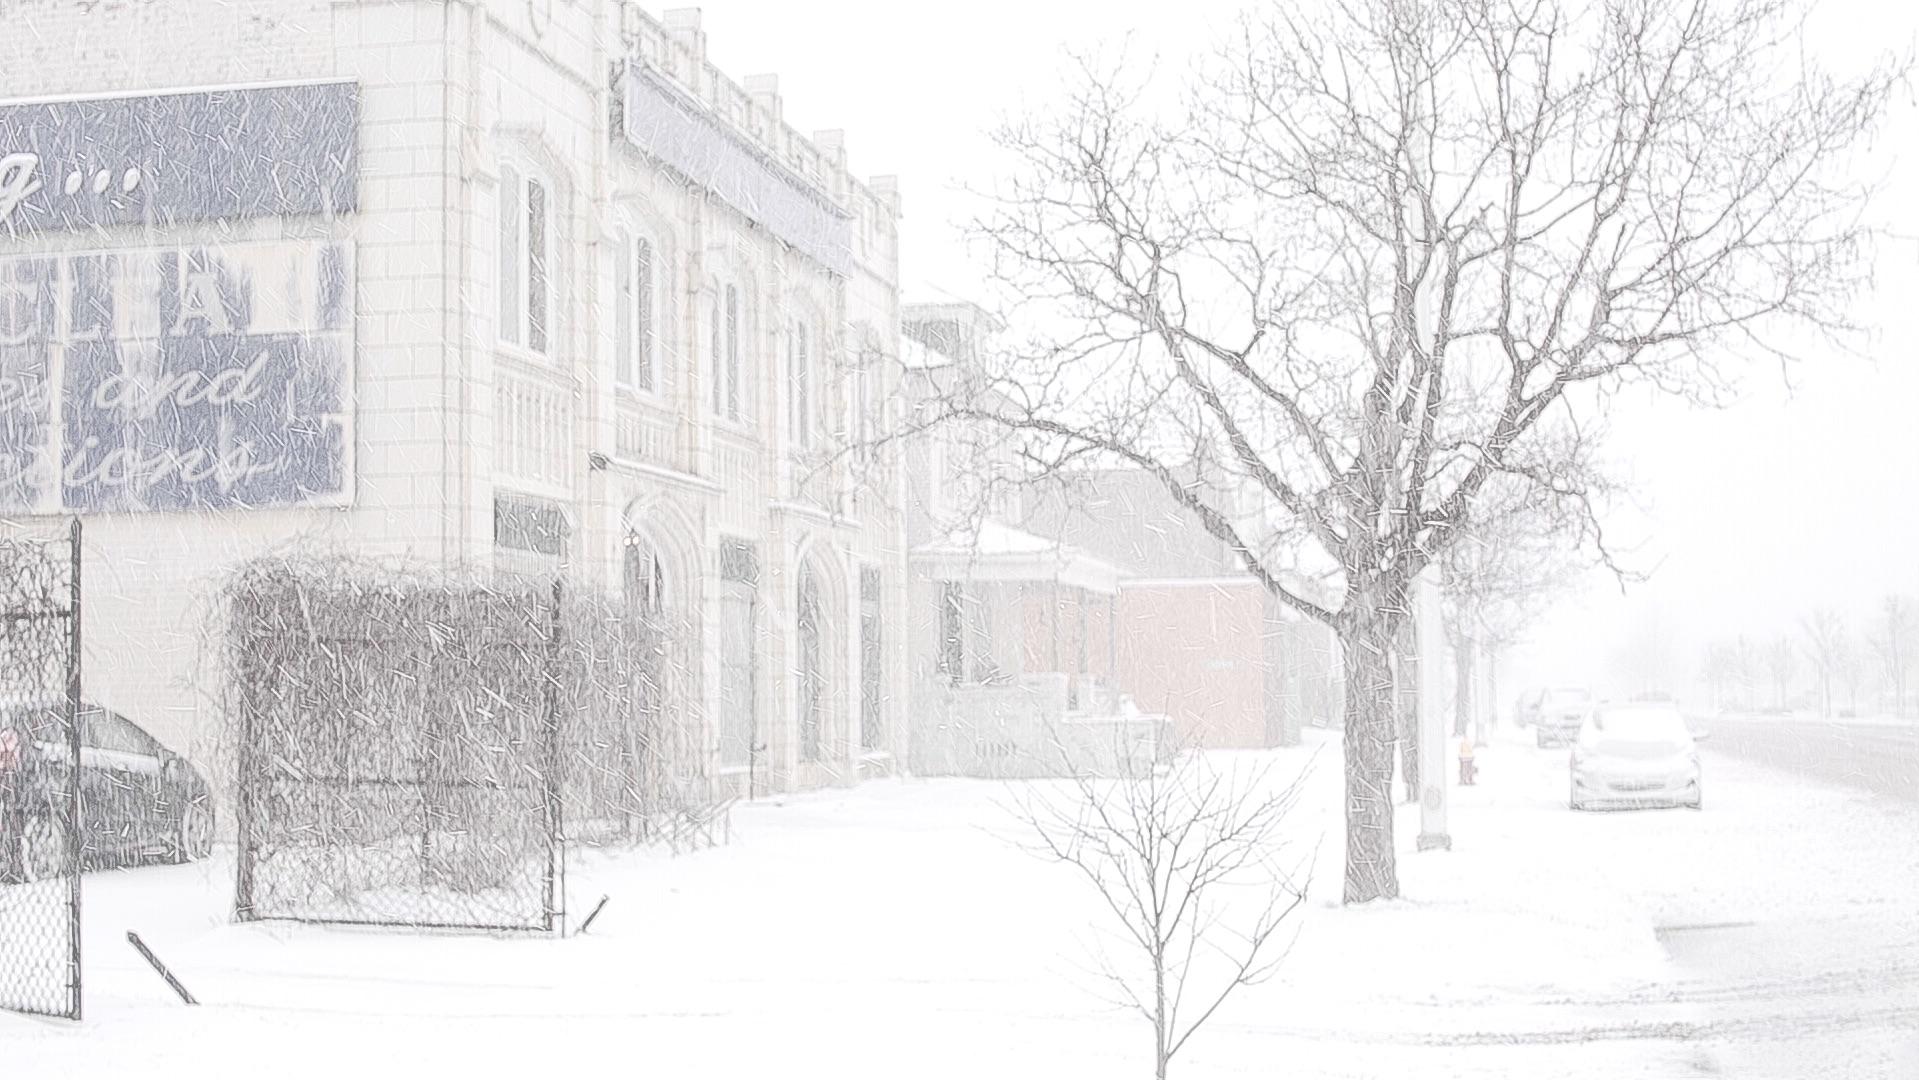 Jam handy film studios in the snow. photo - stewart french